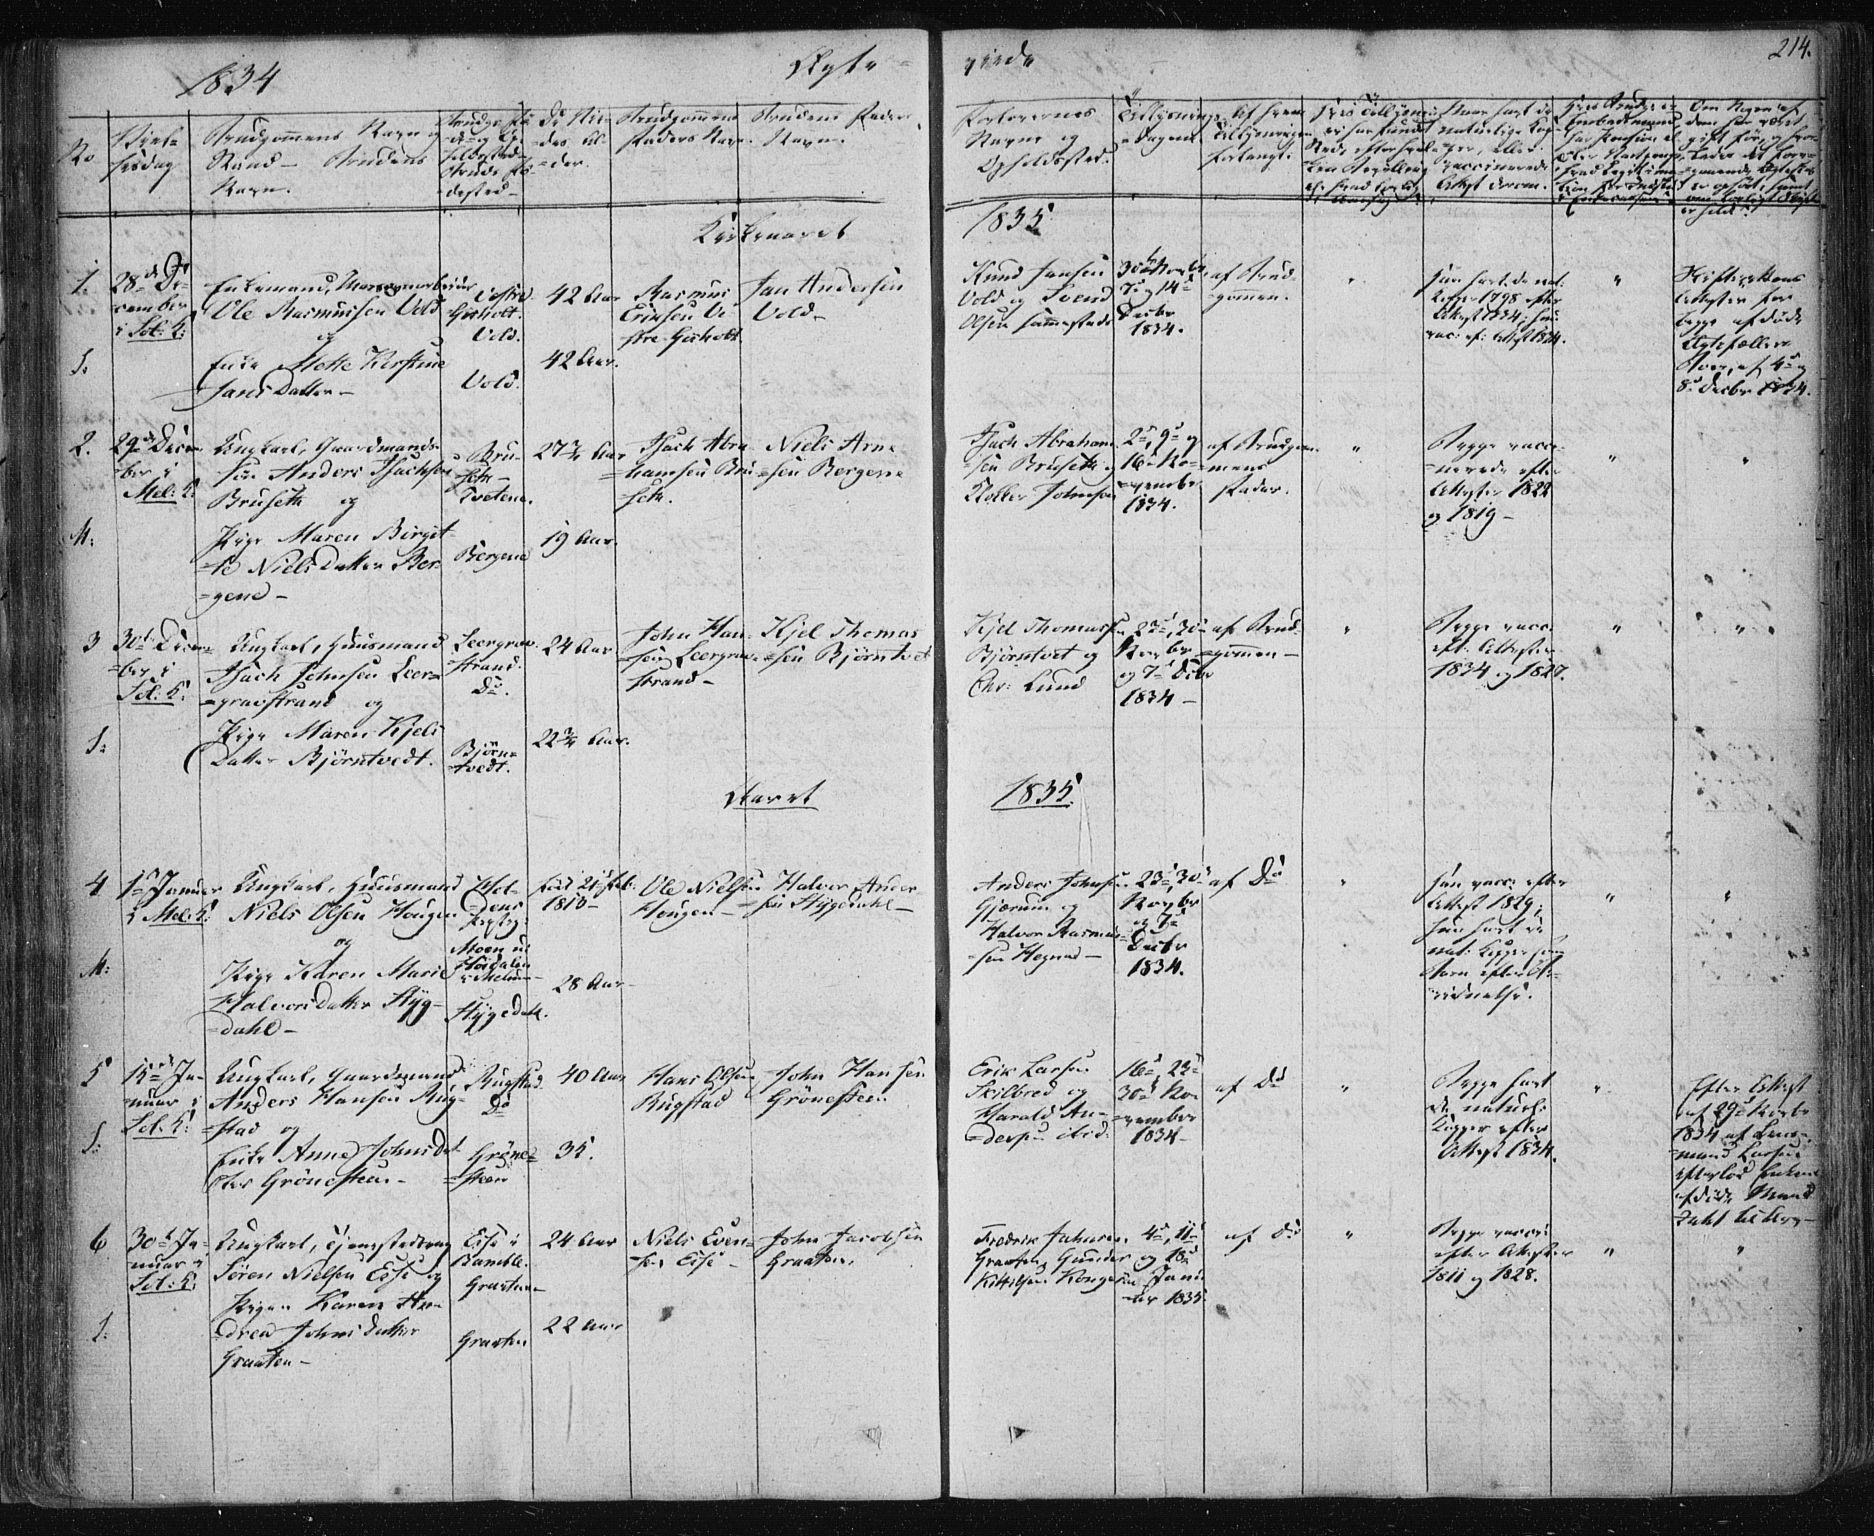 SAKO, Solum kirkebøker, F/Fa/L0005: Ministerialbok nr. I 5, 1833-1843, s. 214